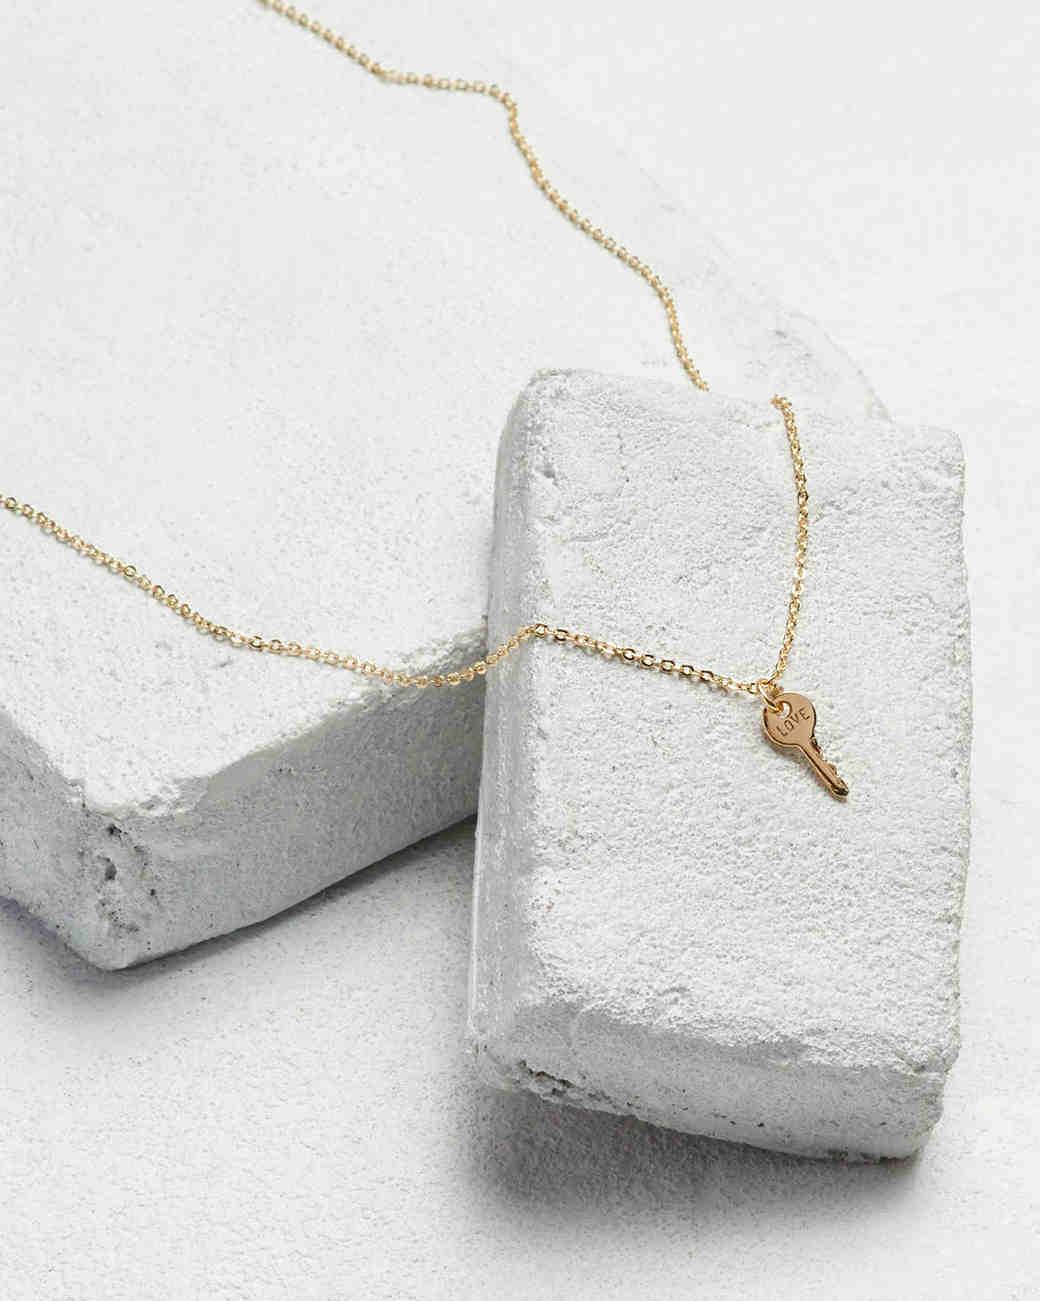 Bridesmaids gift idea mini key necklace